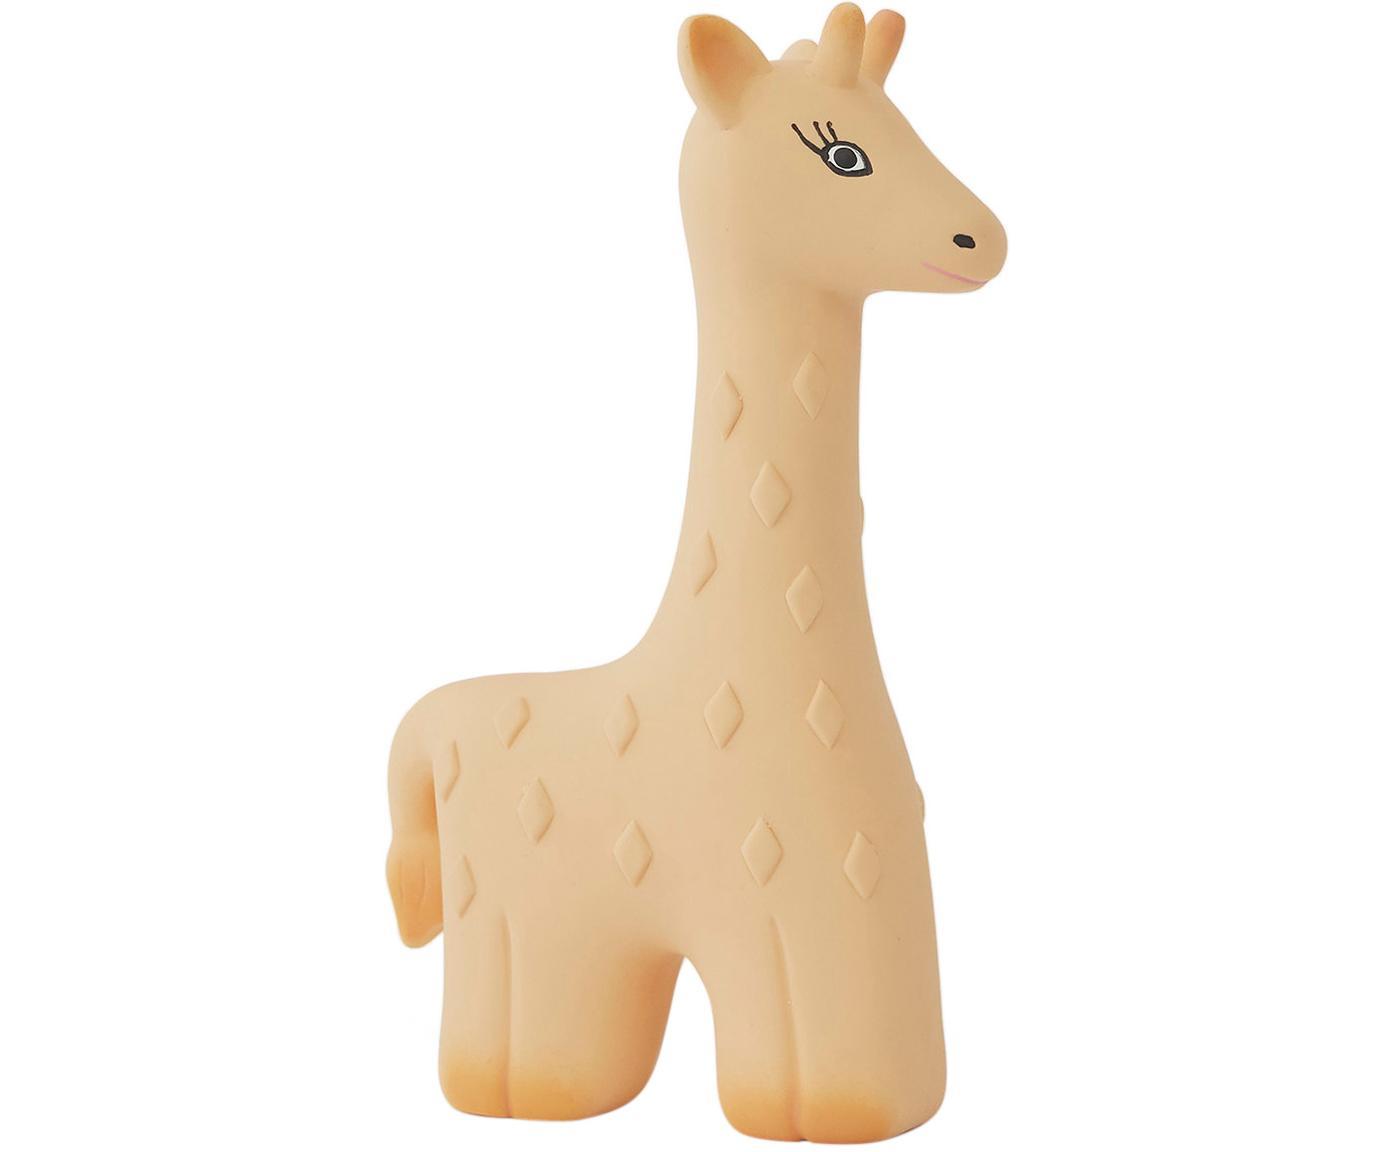 Giocattolo massaggiagengive Giraffe Noah, Senza gomma, BPA e ftalati, Beige, nero, Larg. 10 x Alt. 15 cm